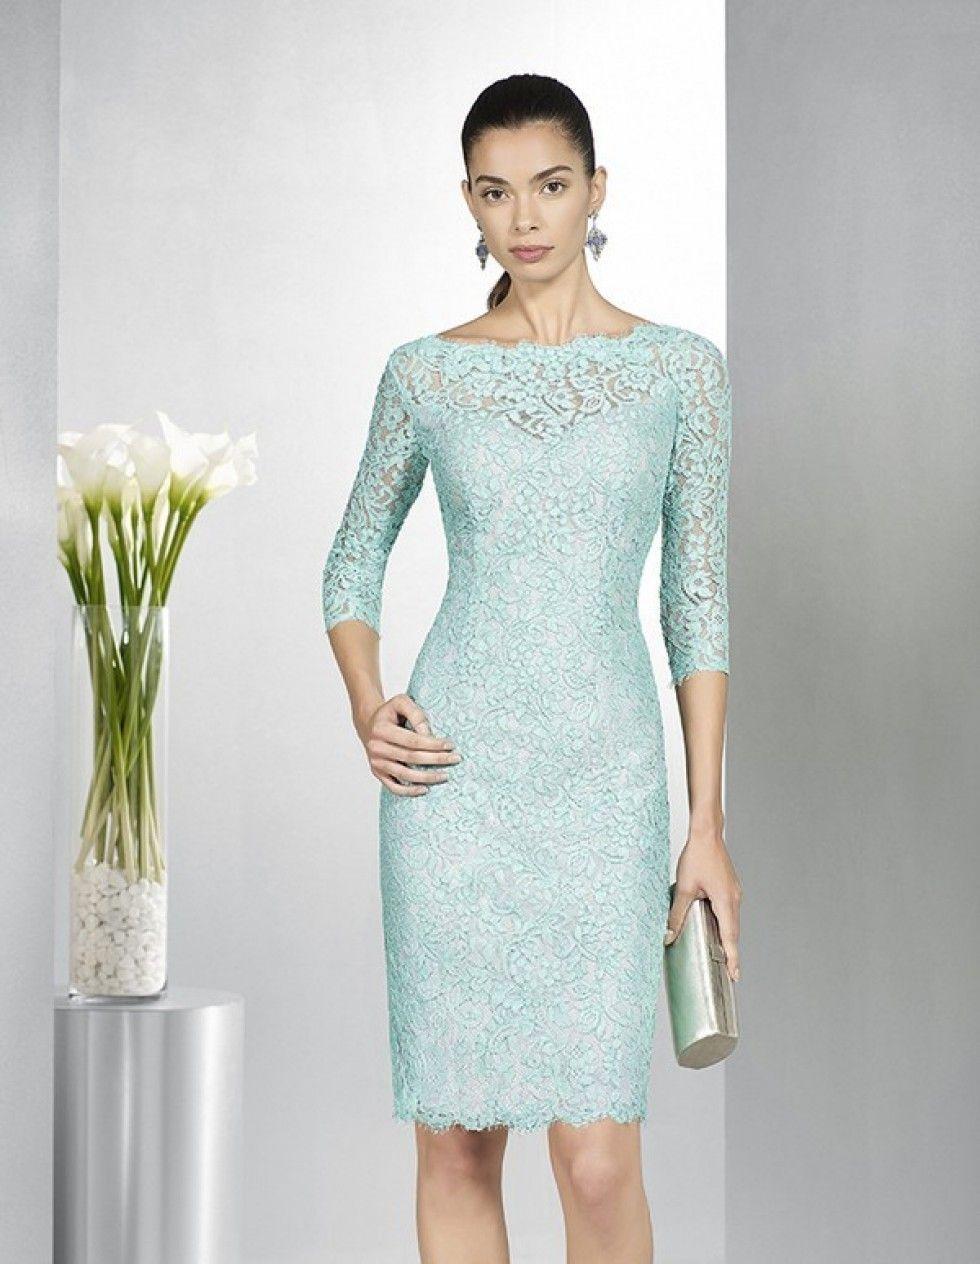 Vestido de fiesta - Couture Club 02C | Odet Saüc | elbise modelleri ...